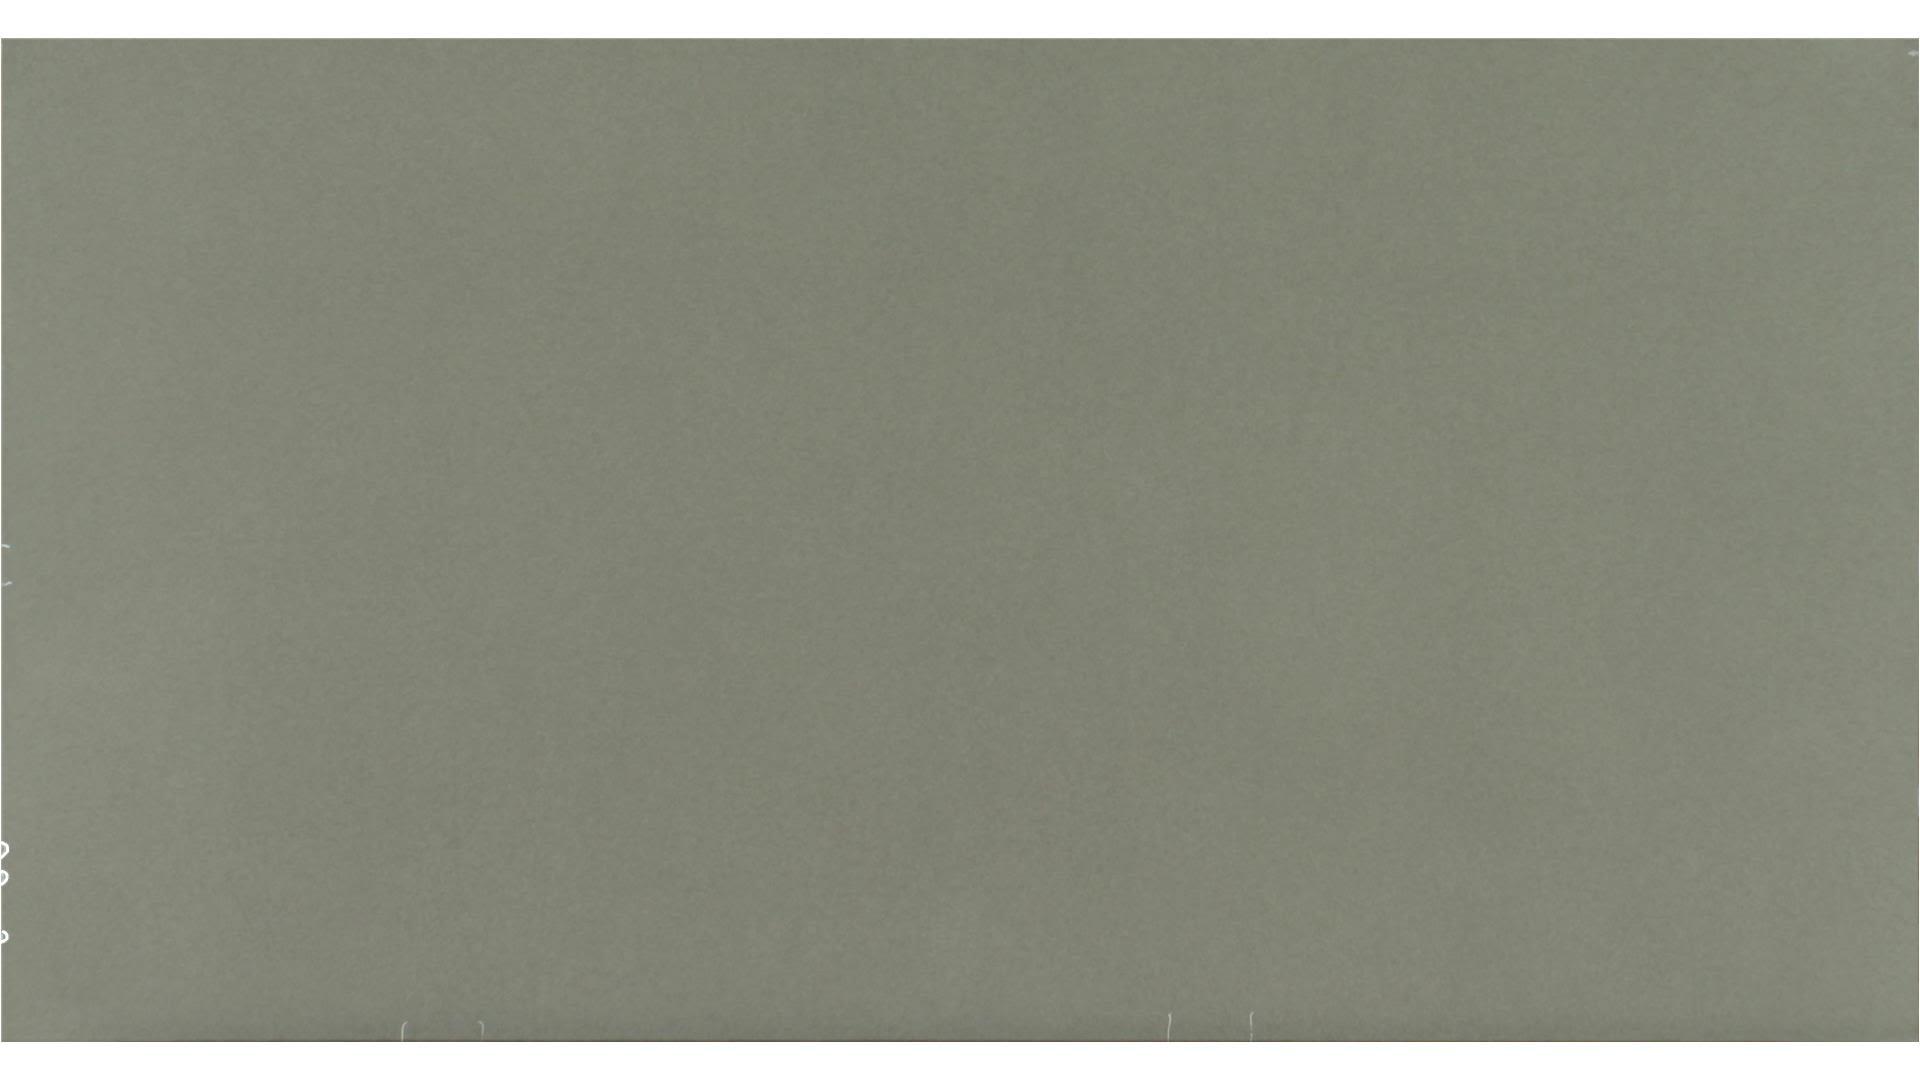 Dove Grey Slab By Corian Quartz